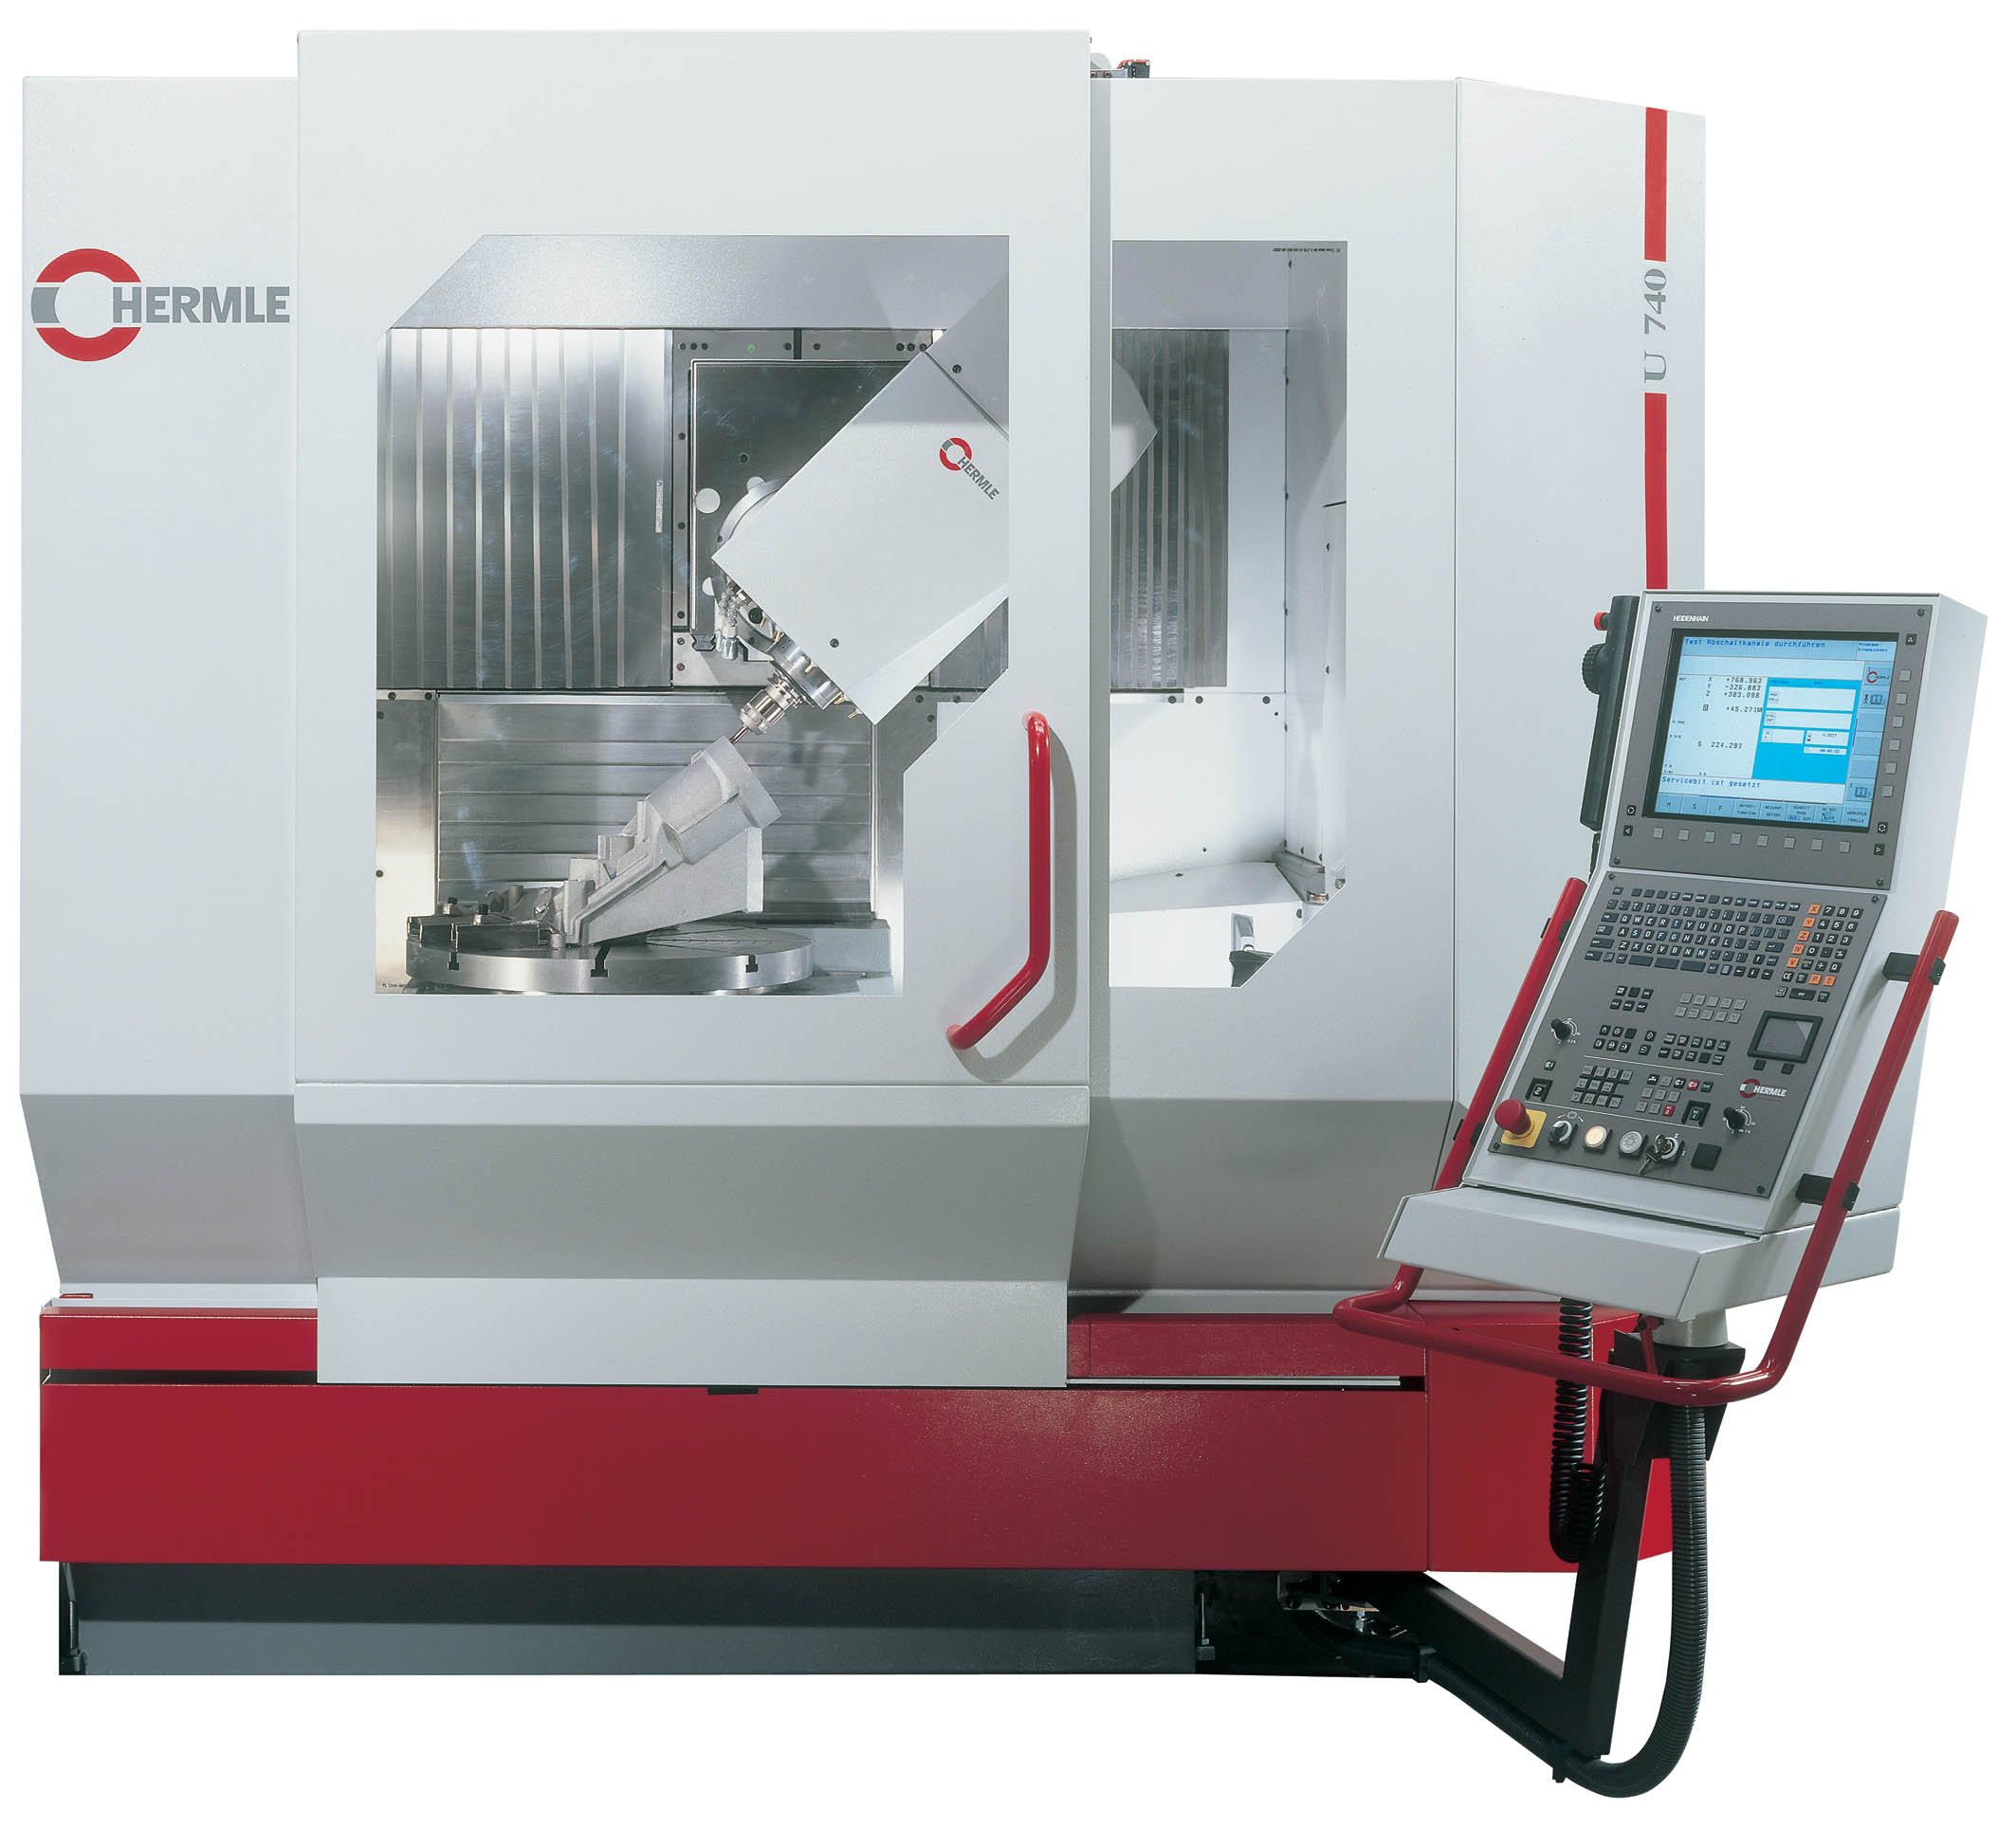 Gebrauchte Maschinen / Maschinenfabrik Berthold Hermle AG